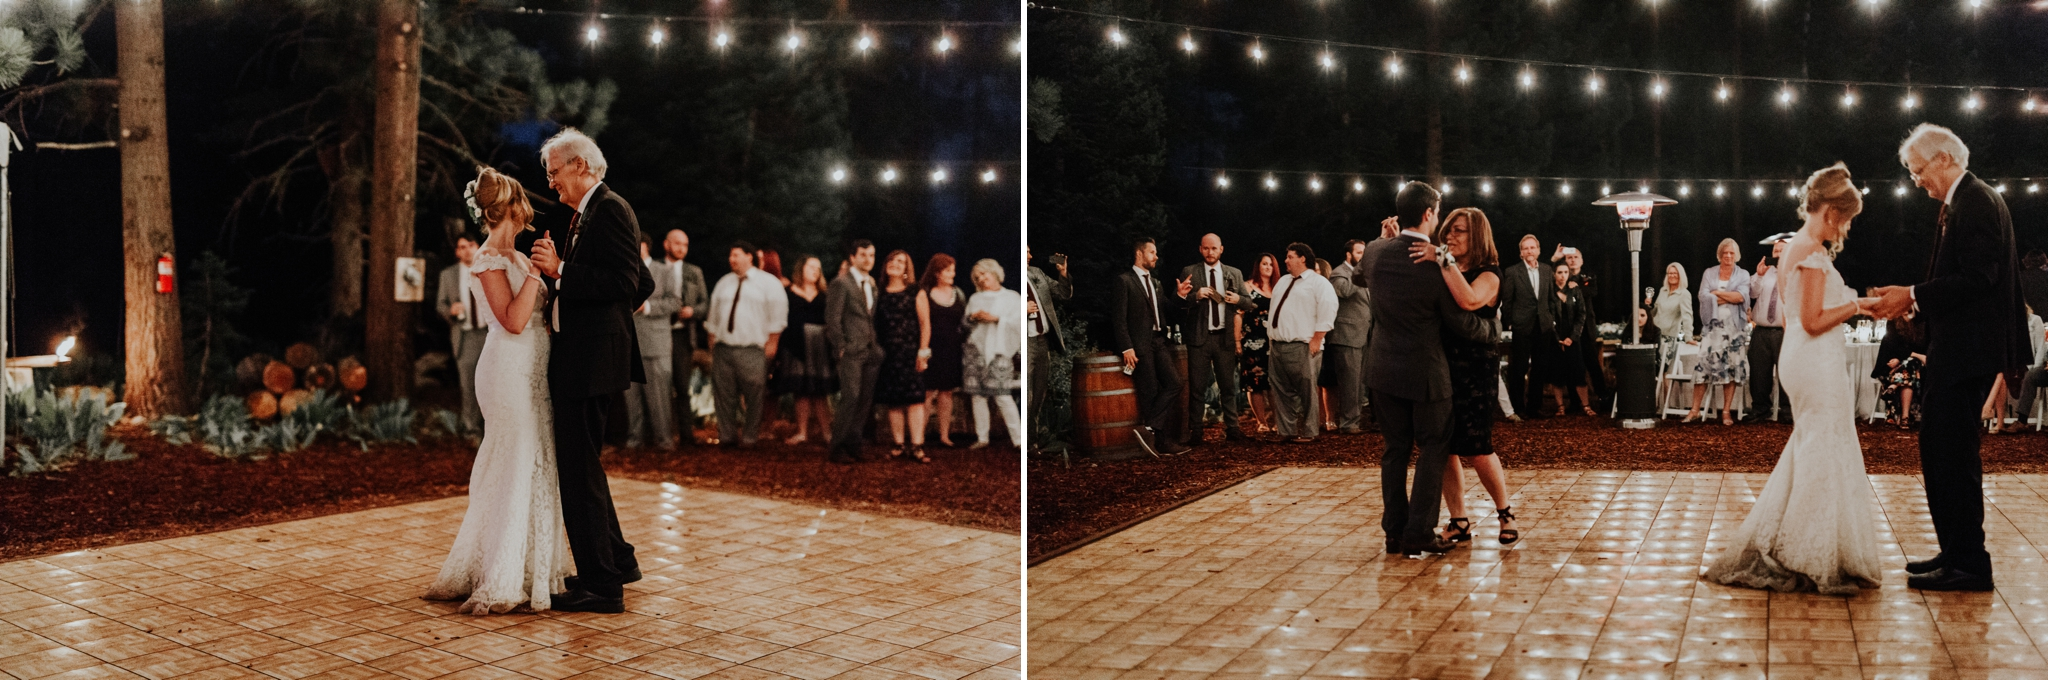 tahoe-wedding-photographer26.jpg